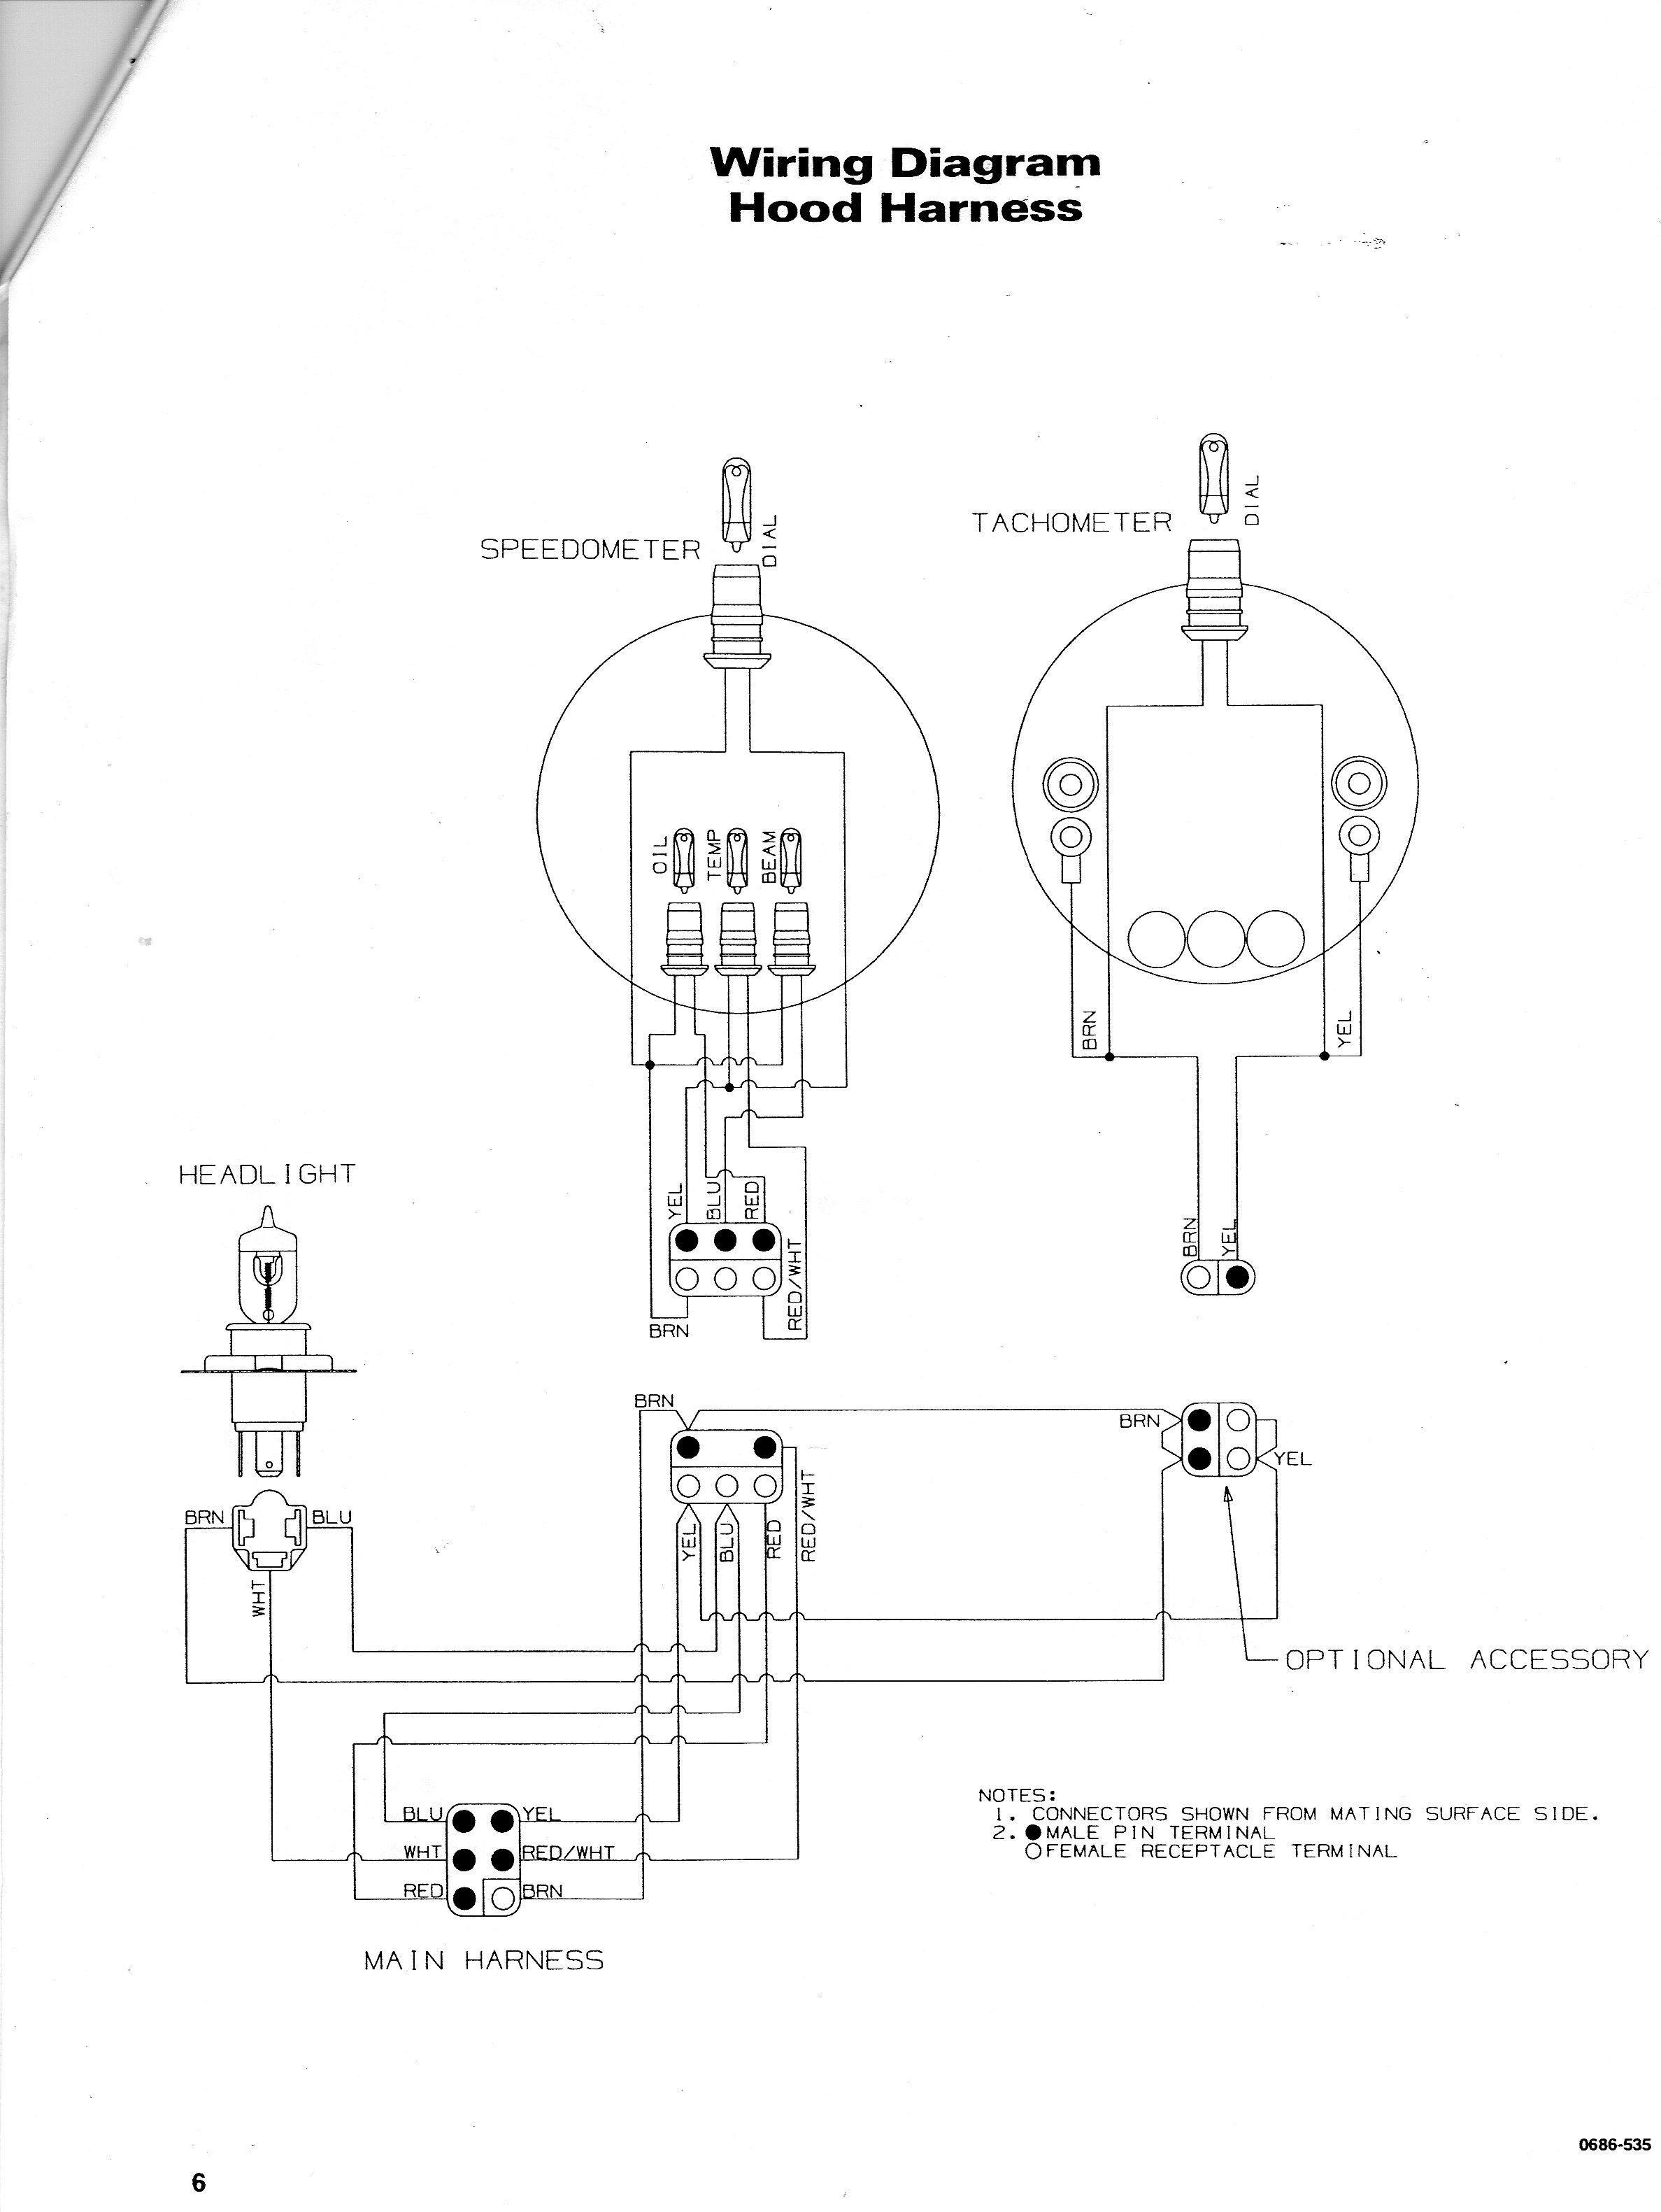 wiring diagram 98 arctic cat z wiring diagram u2022 rh msblog co 97 Arctic Cat ZL 440 1998 Arctic Cat ZL 440